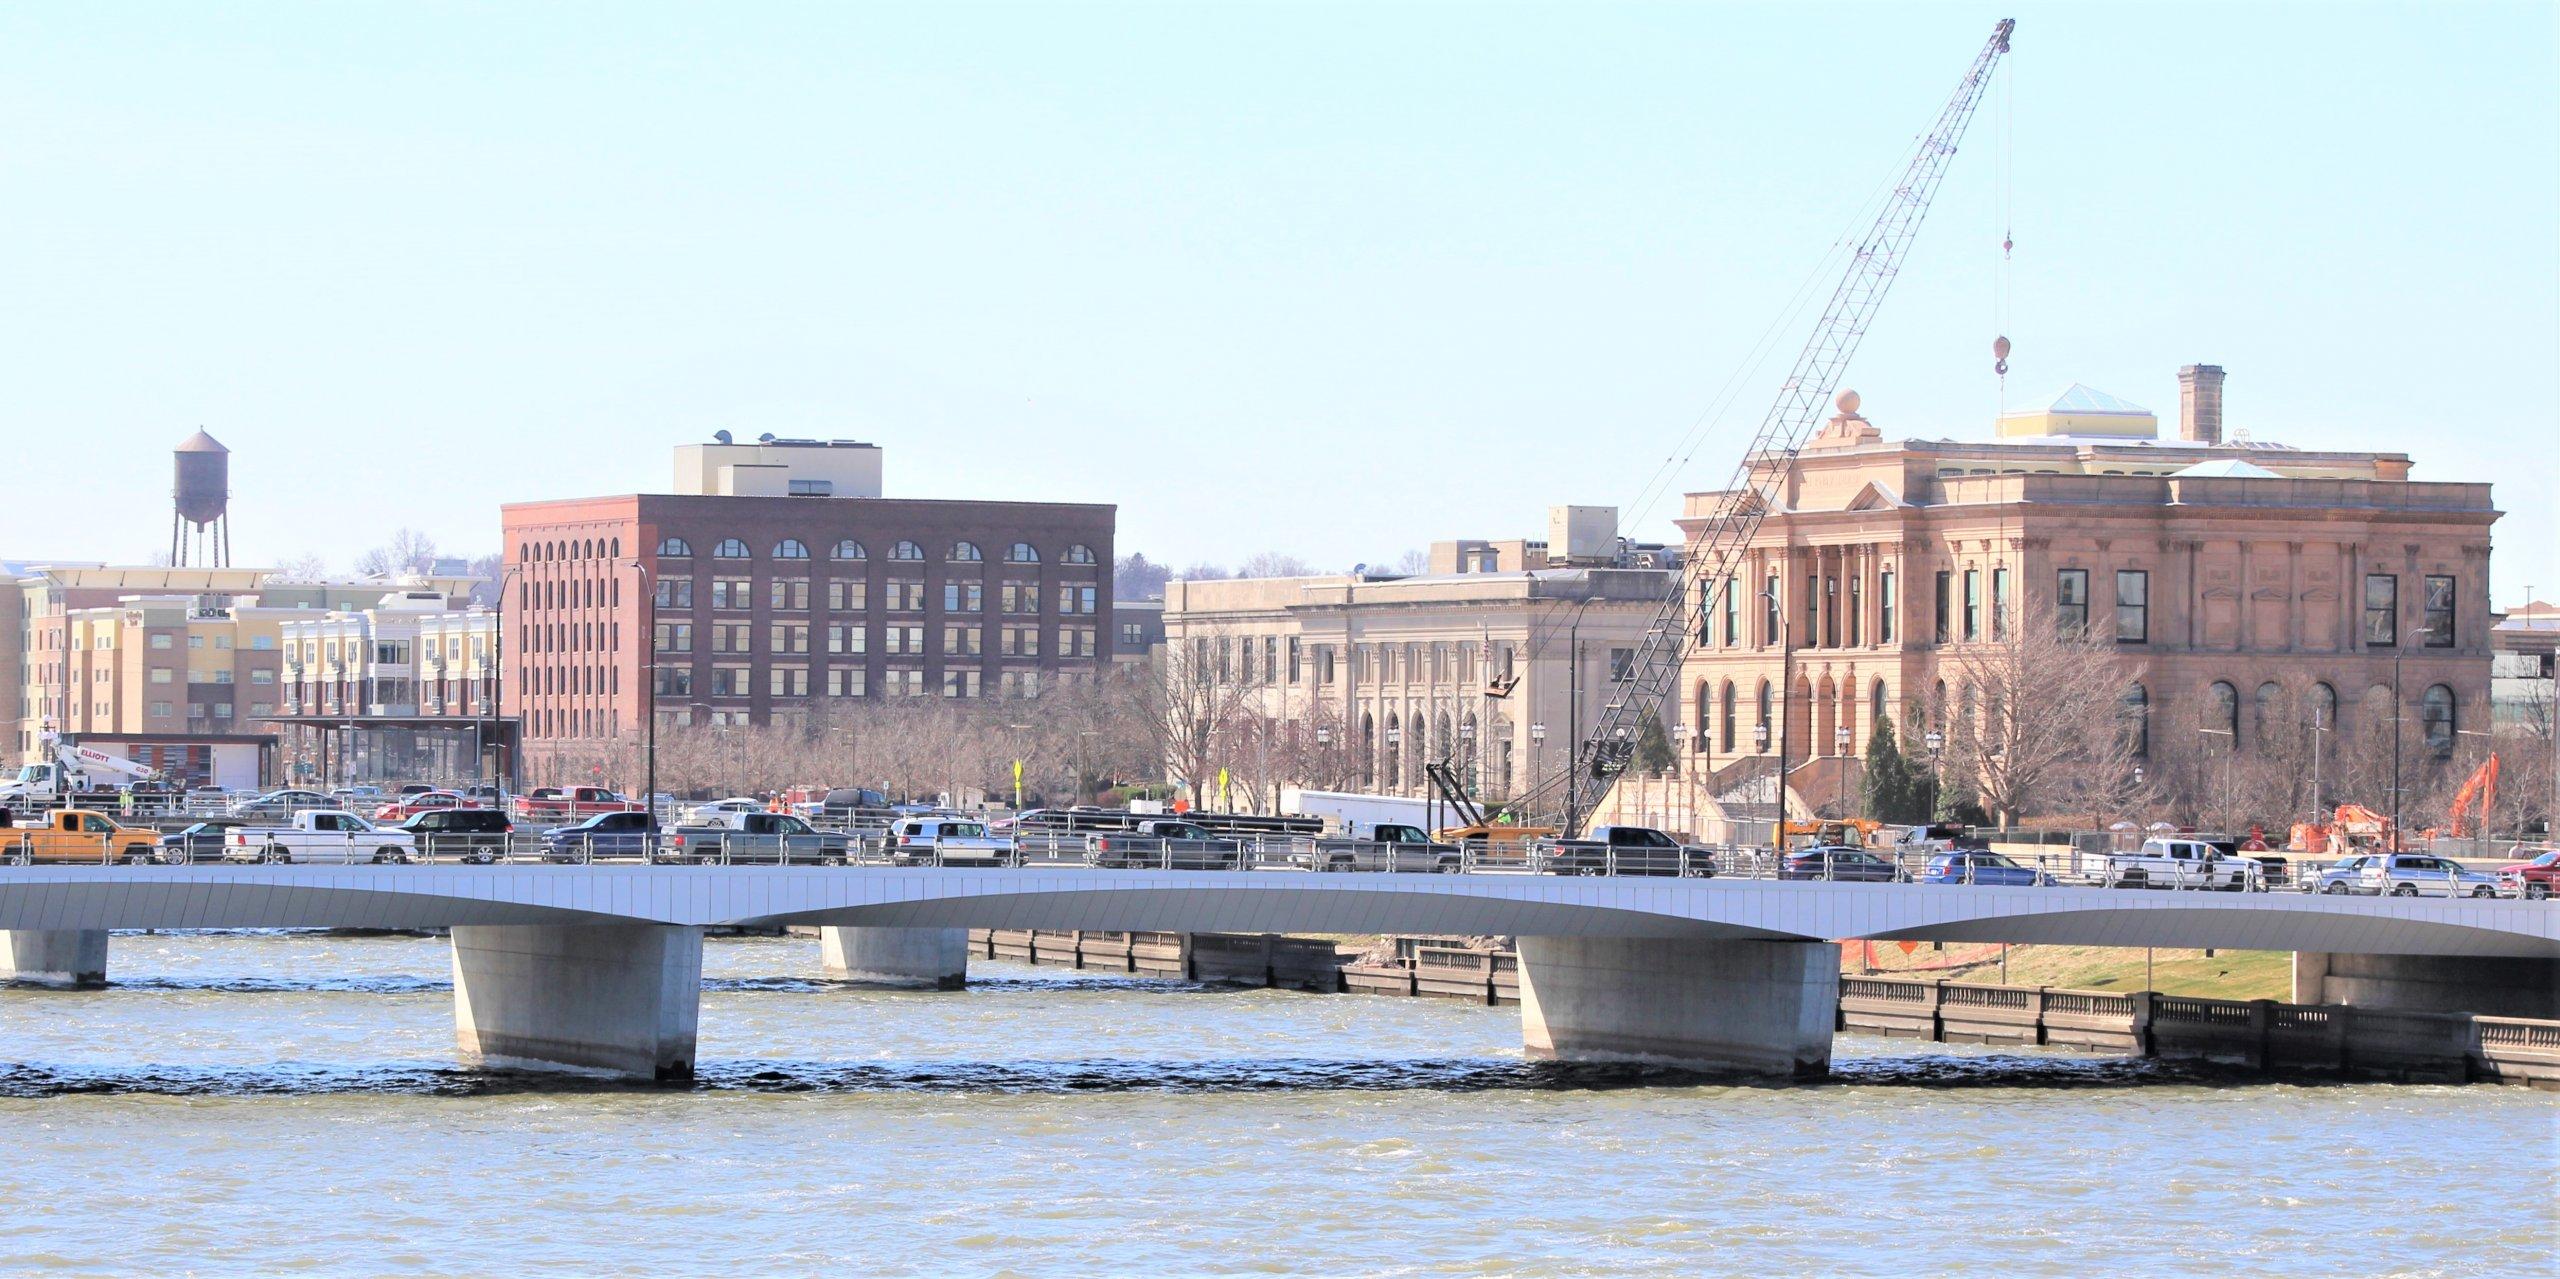 DOT: More than 60% of Iowa's bridges 'fair' or 'poor'